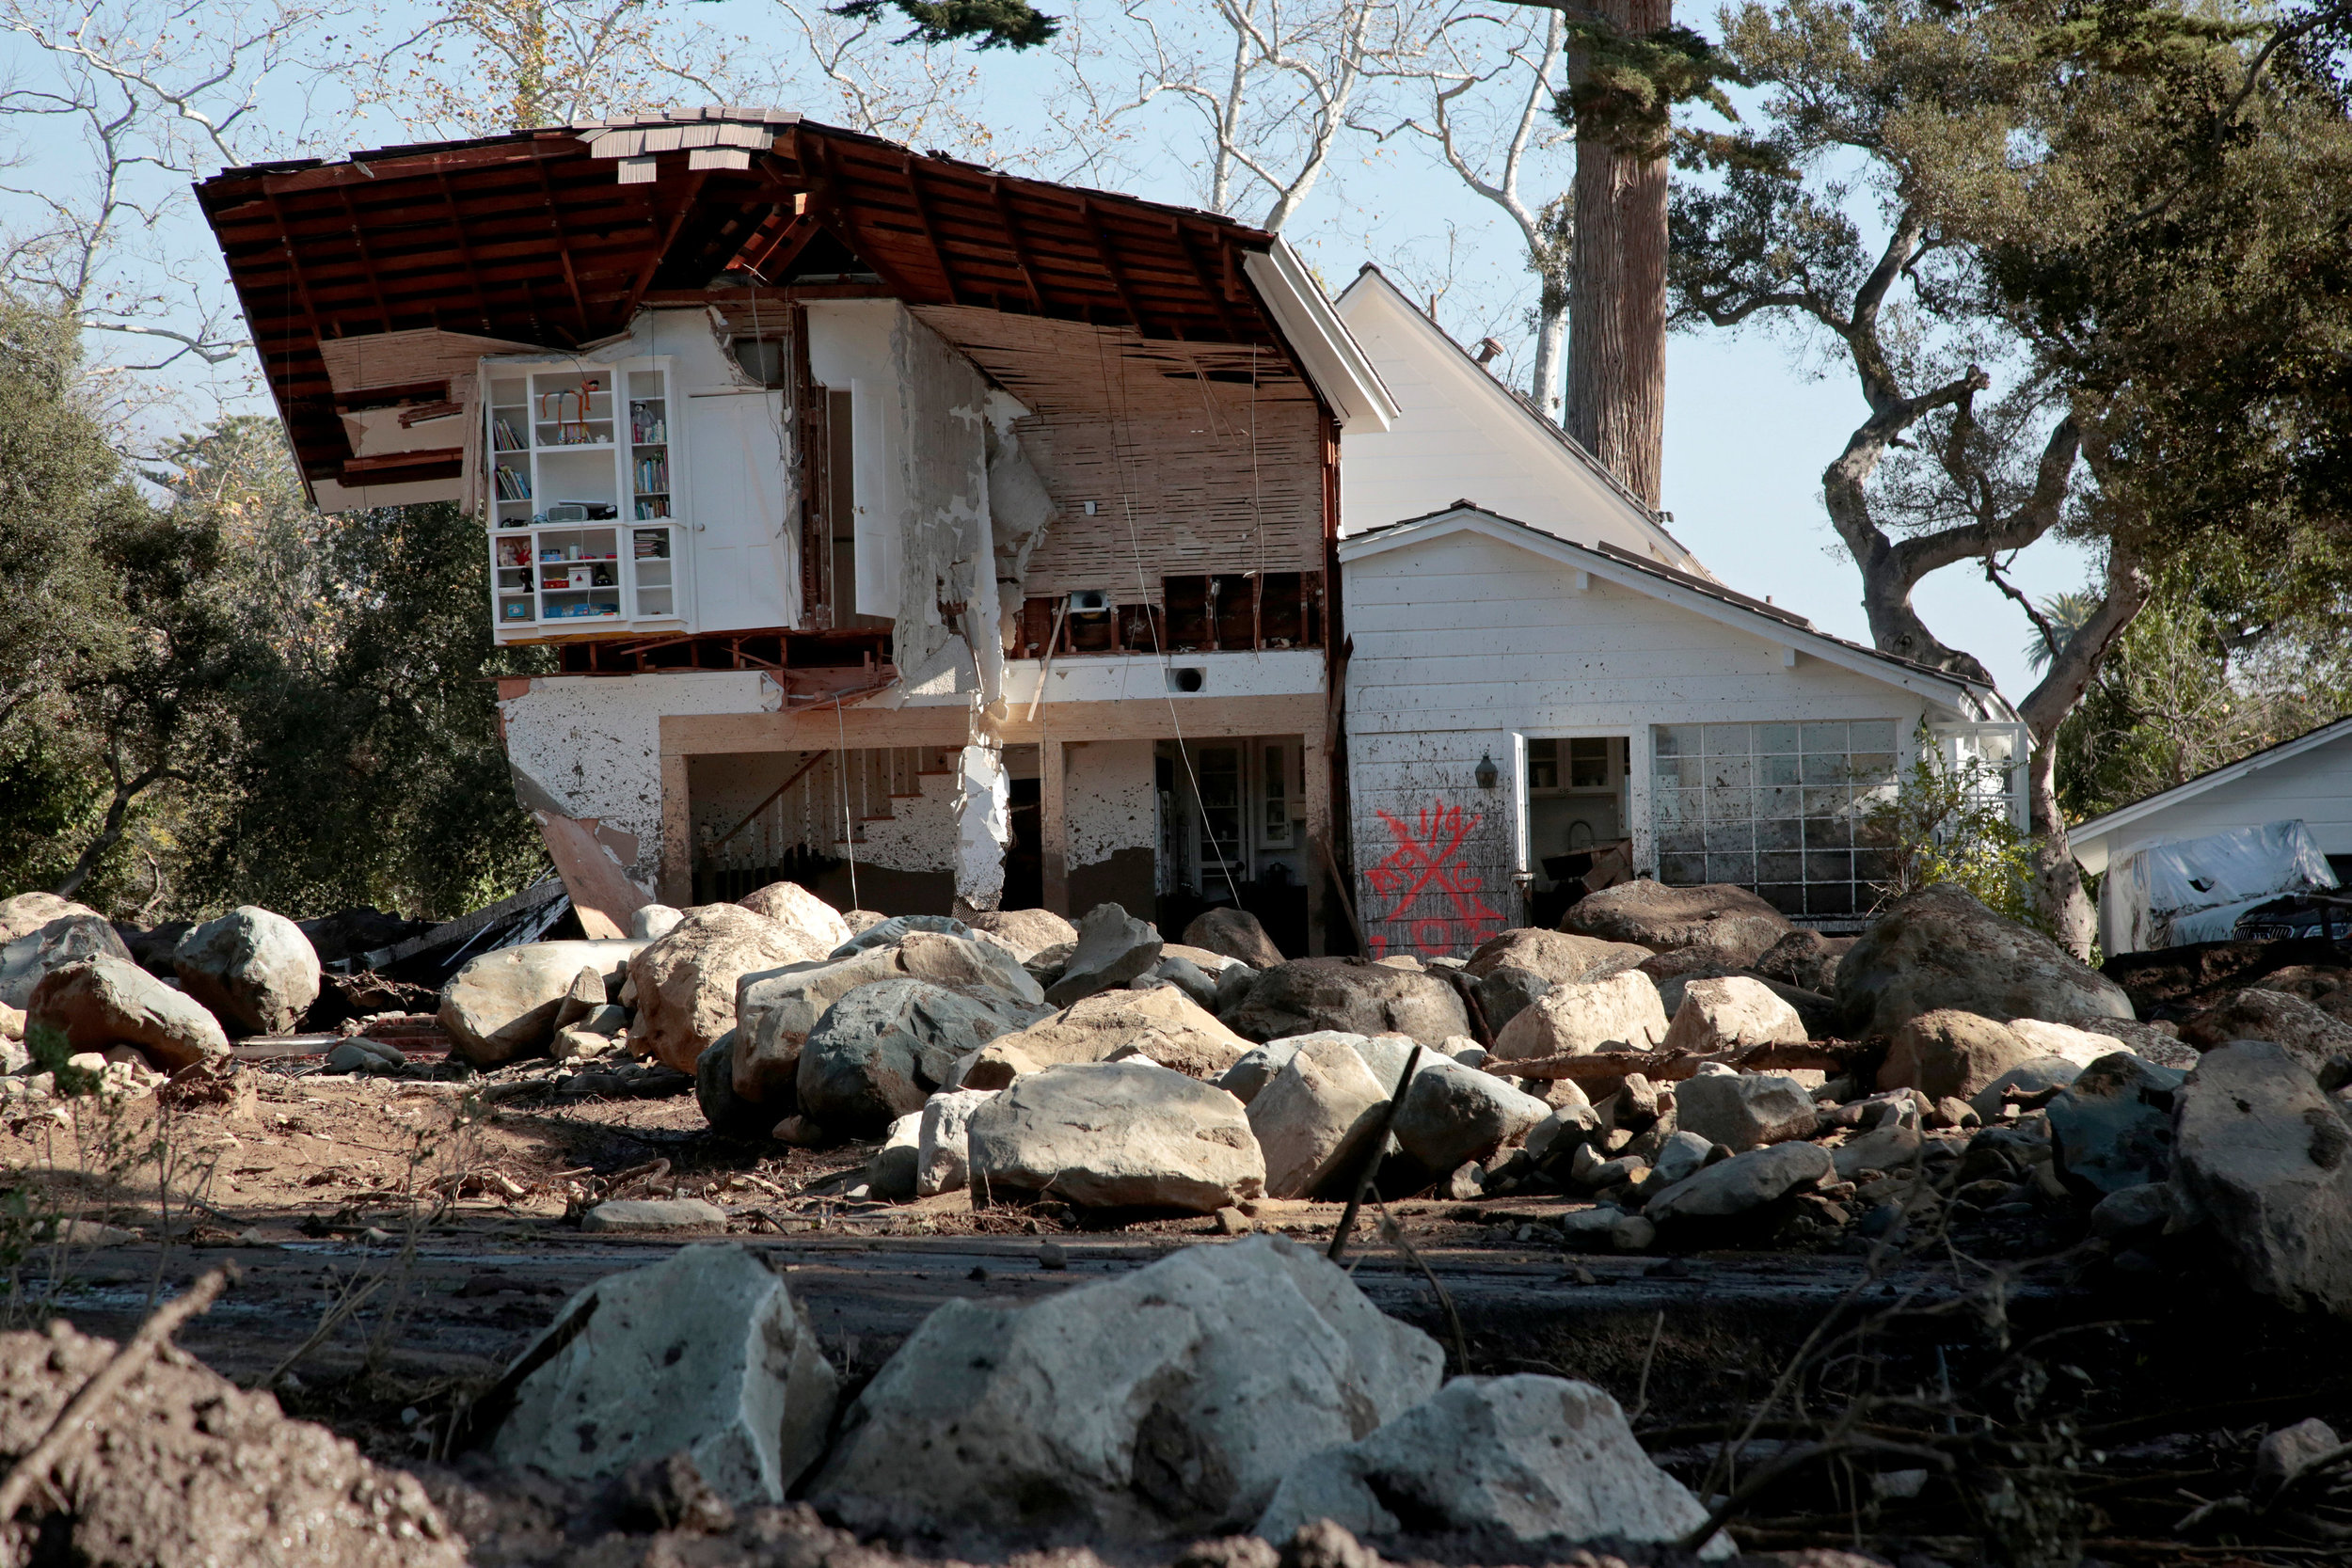 A Montecito home post mudslide |Image: Santa Barbara Independent